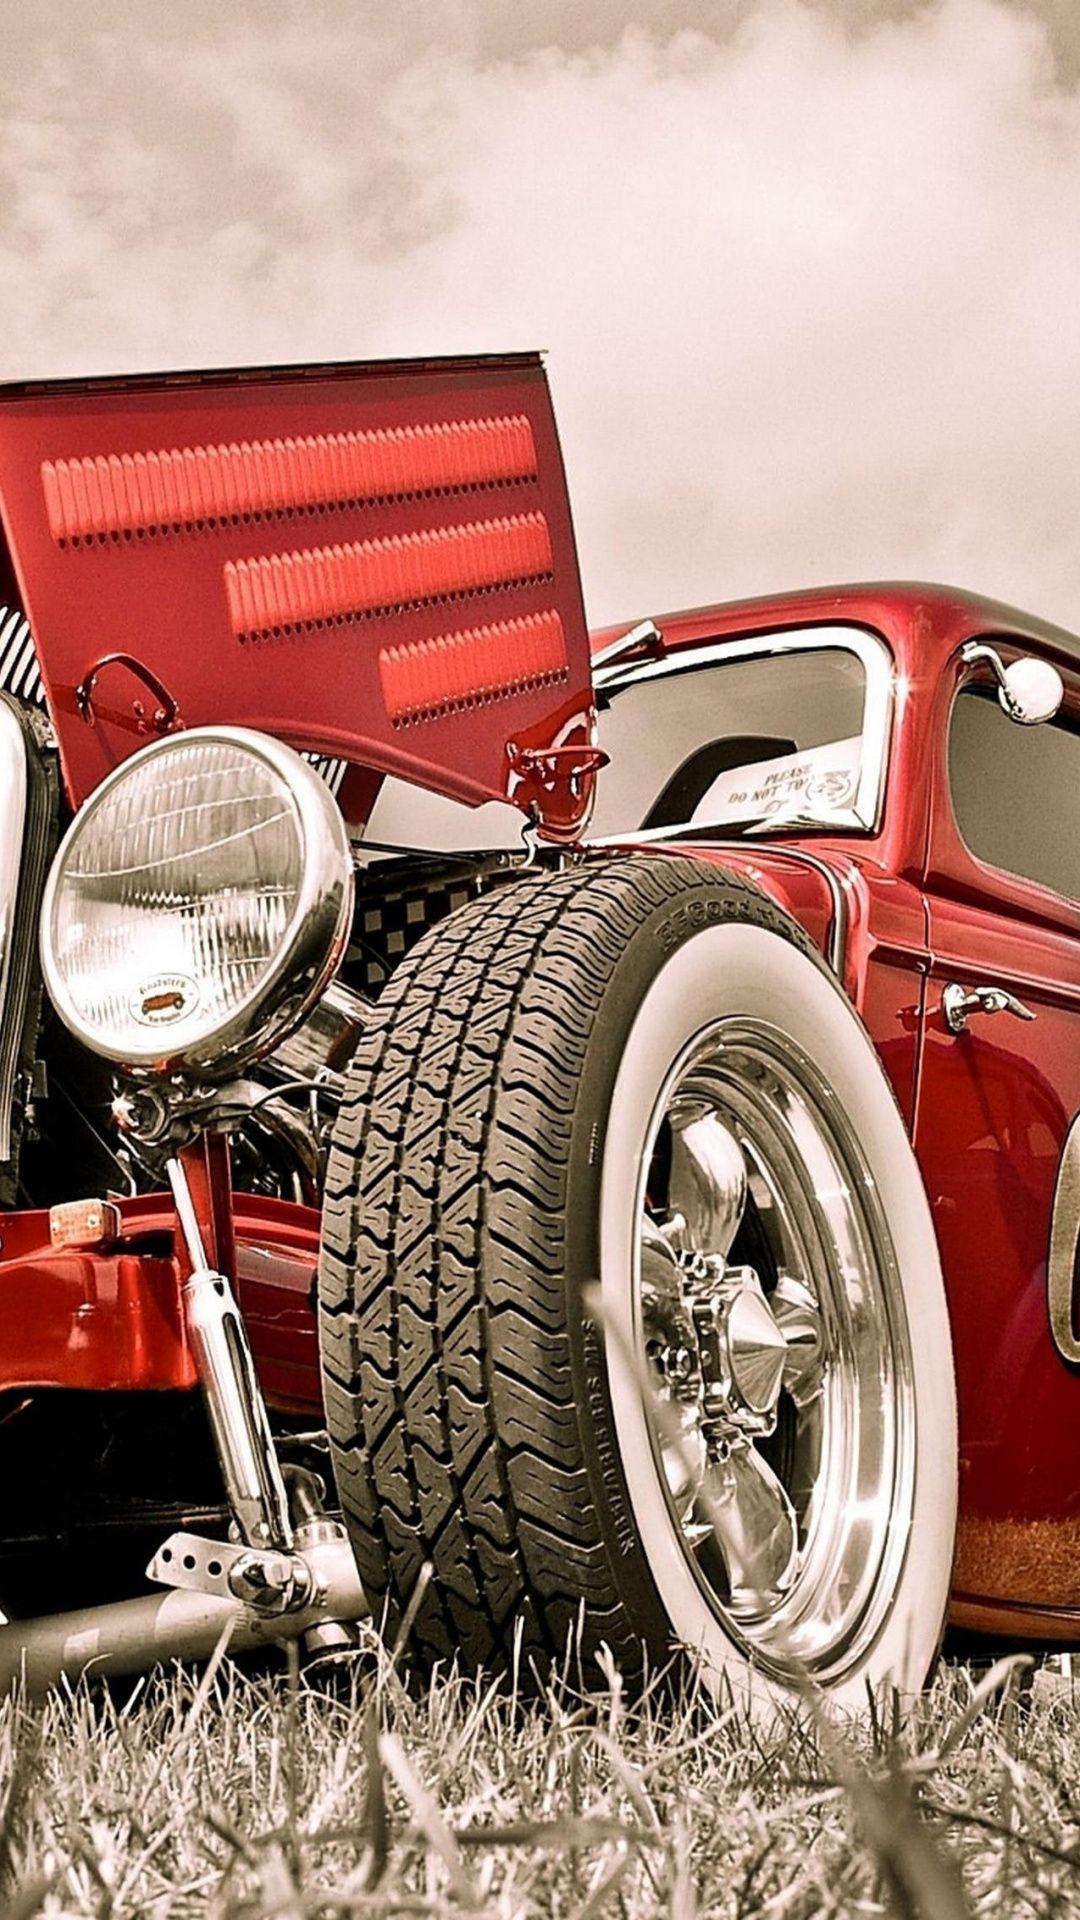 Wallpapers Pagani Zonda Car Hot Rod Muscle Car Classic